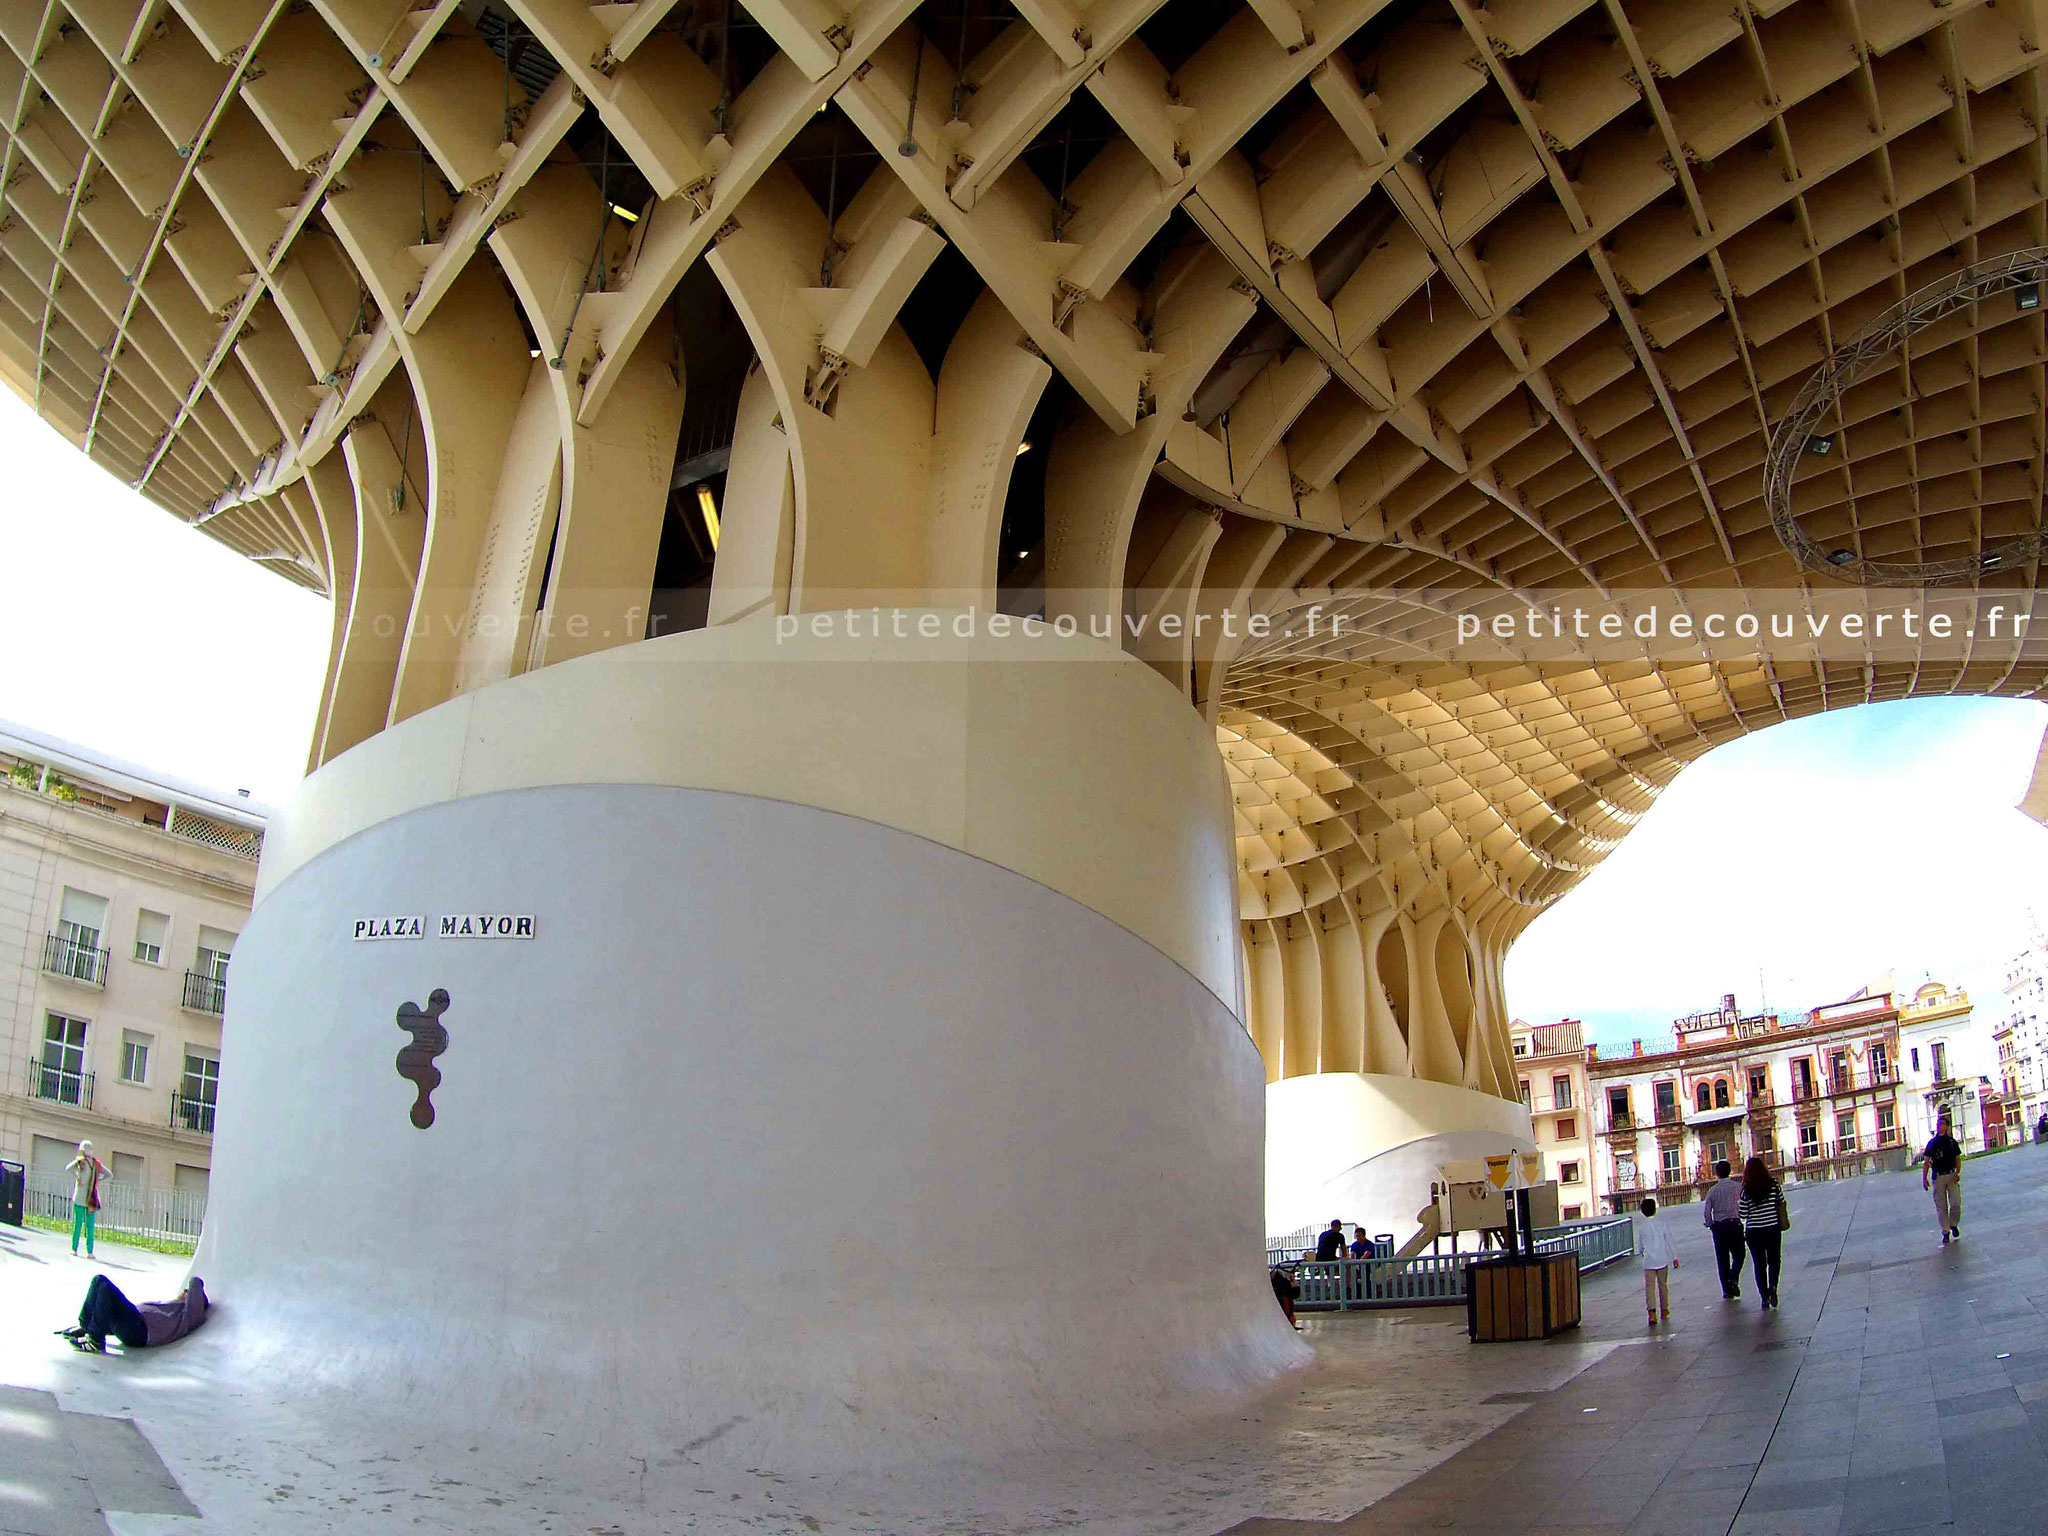 La metropol parasol - Las Setas - Séville